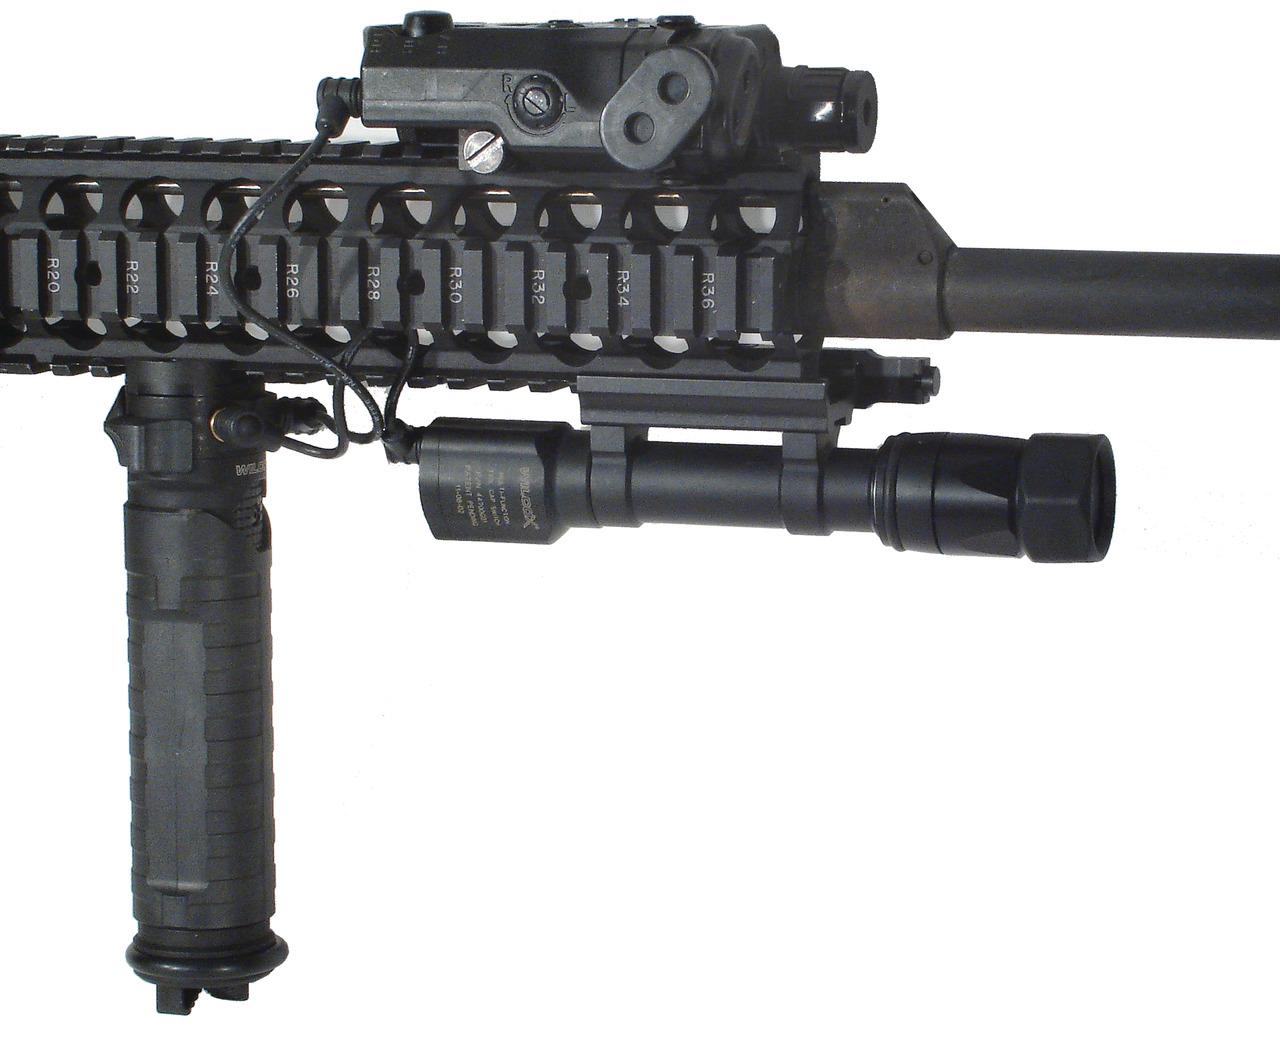 f00ea58e0cf9f6 WILCOX INDUSTRIES CORP. Universal Control Vertical Grip (UCVG) in Firearm  Accessories